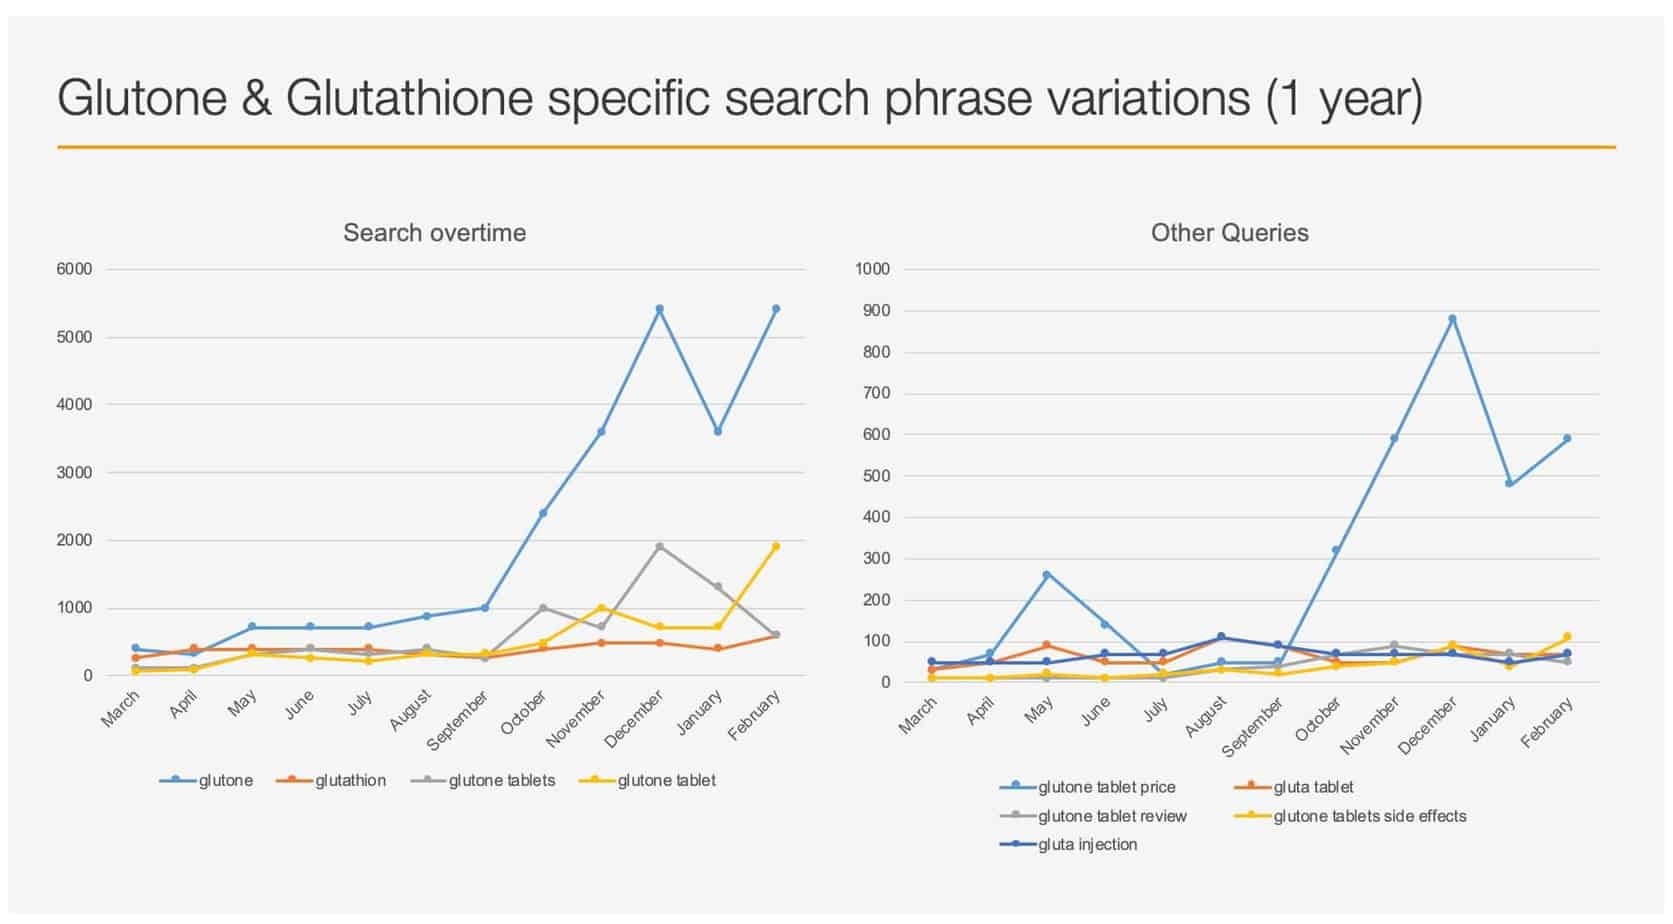 Glutone & Glutathione specific Search Phrase Variations(1 year)